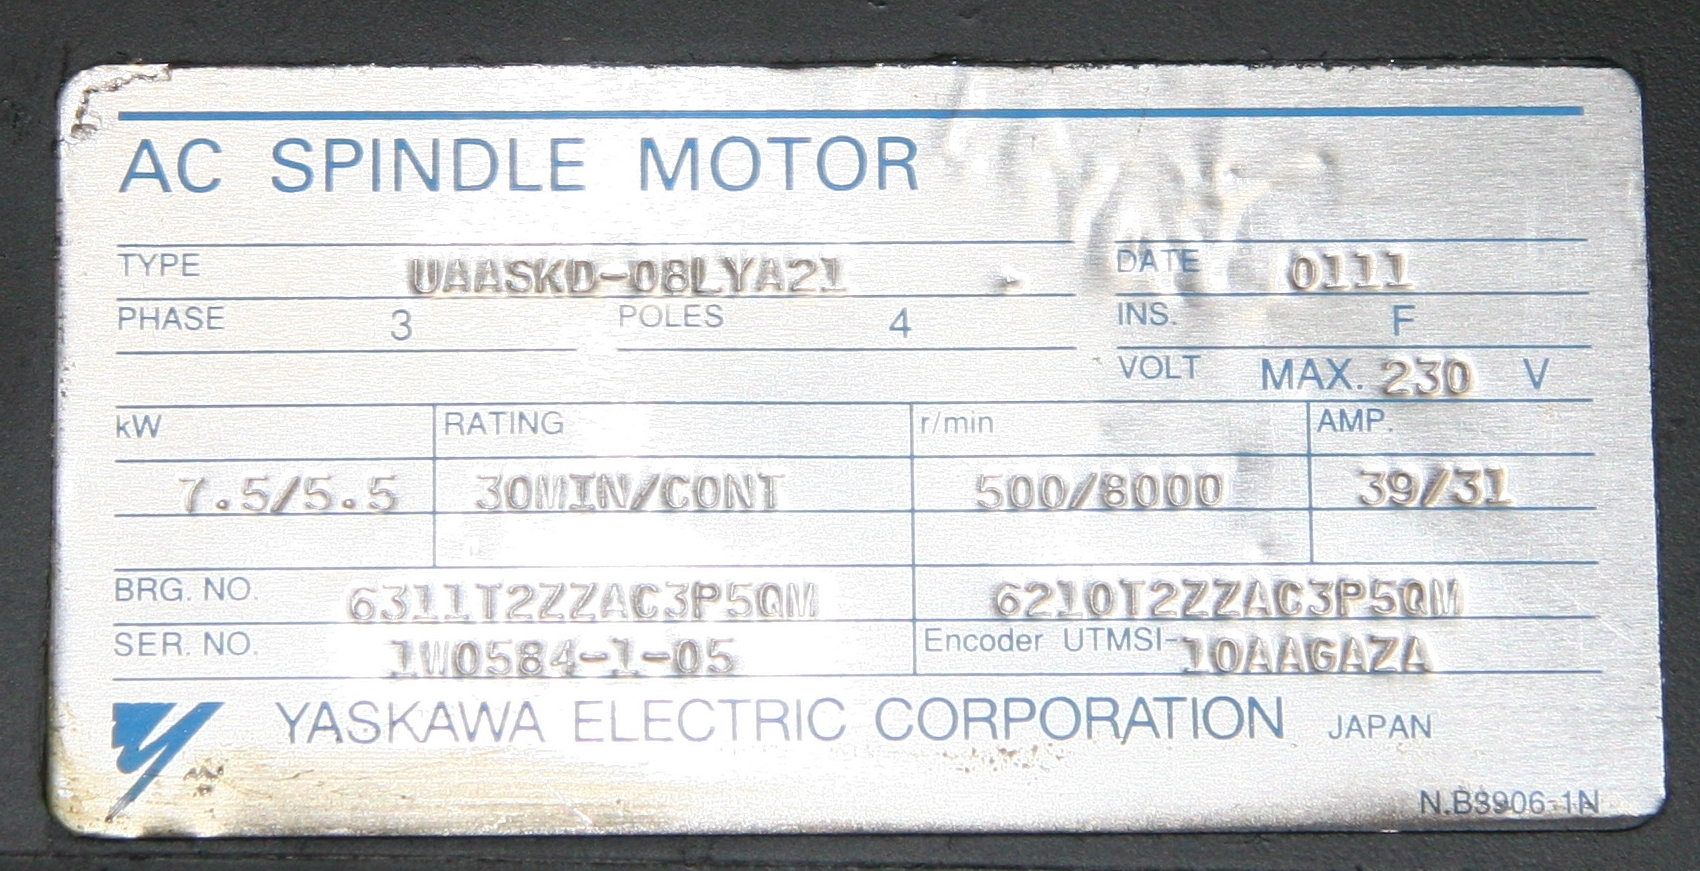 1) Used Yaskawa Electric Corp  UAASKD-08LYA21 AC Spindle